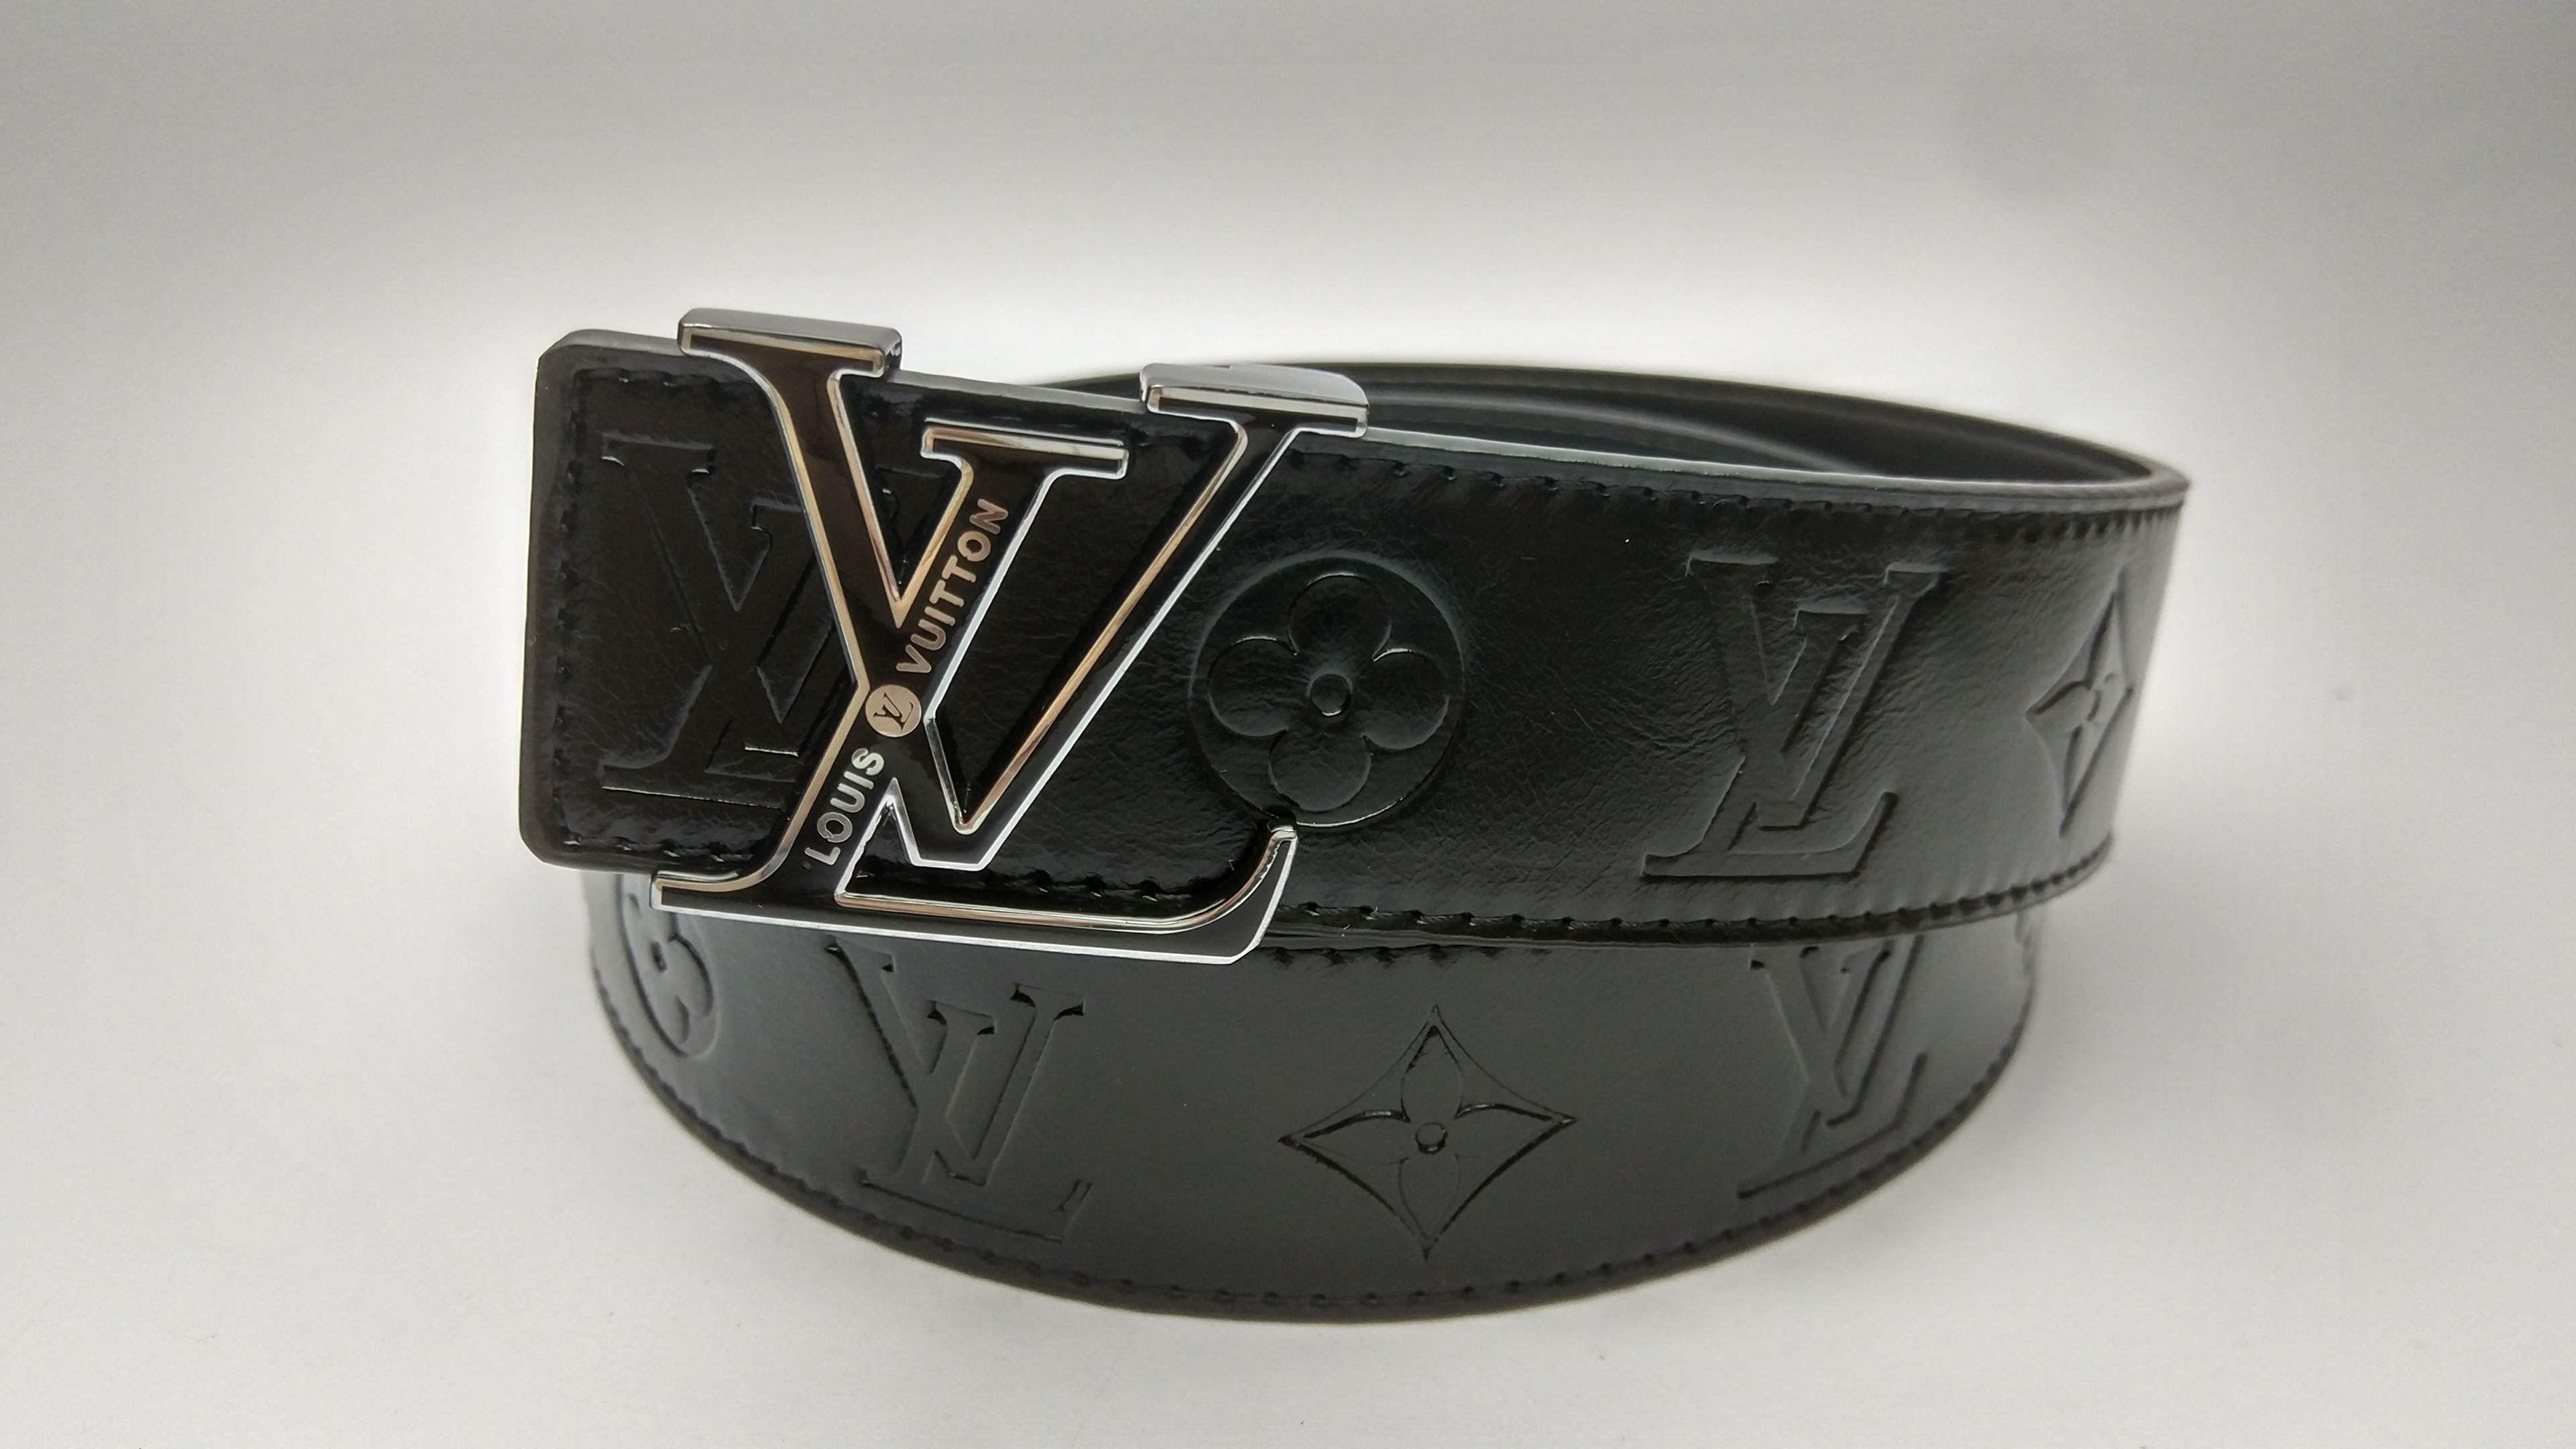 Fashion designer belt Pin Buckle Leather Mens Belts Luxury For Men's Luxury Fashion Leather Belt free shipping 43de